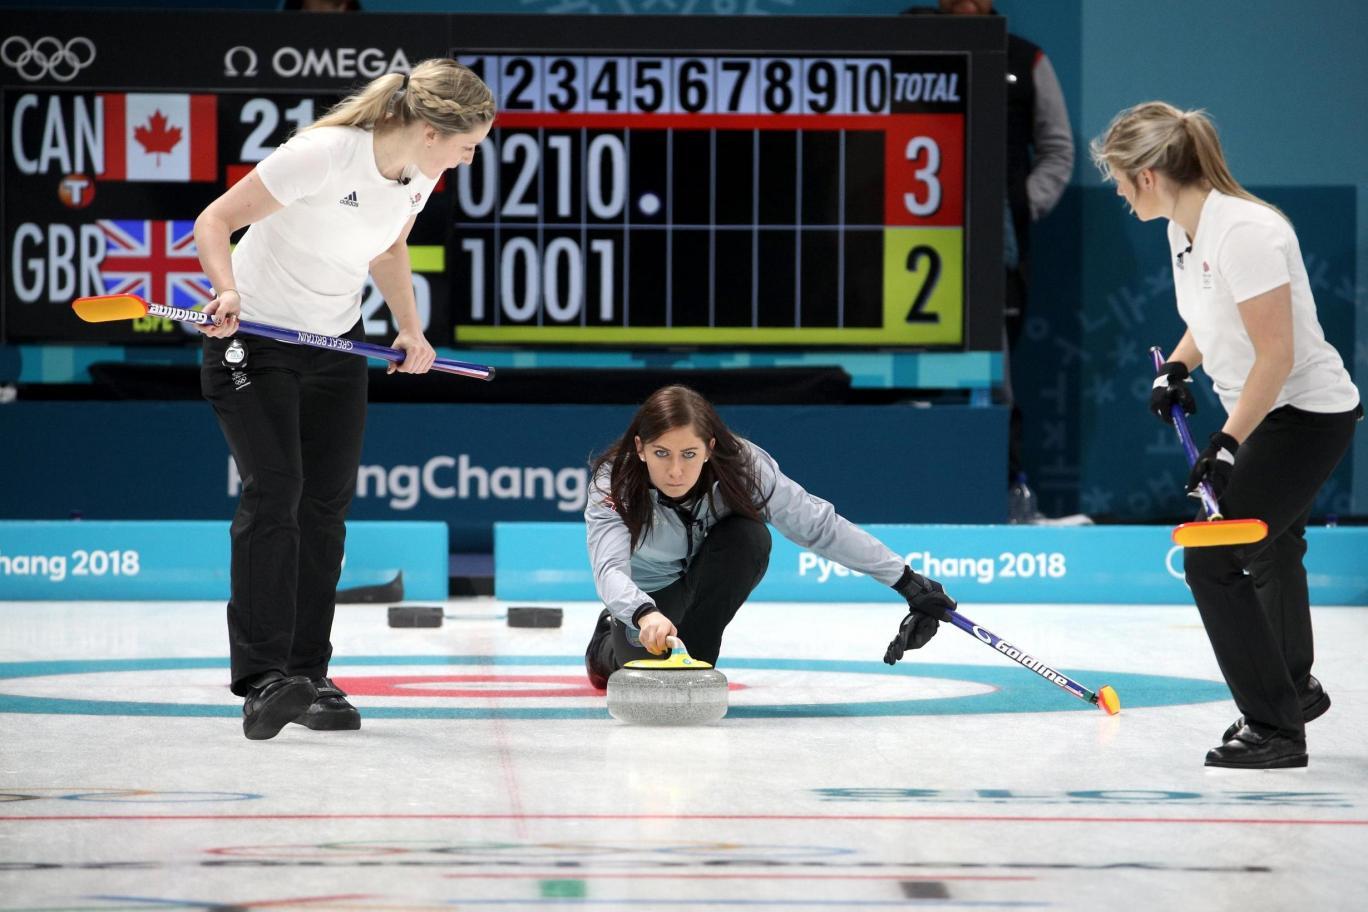 Great Britain Women's Curling Team Advances to Semi-Finals